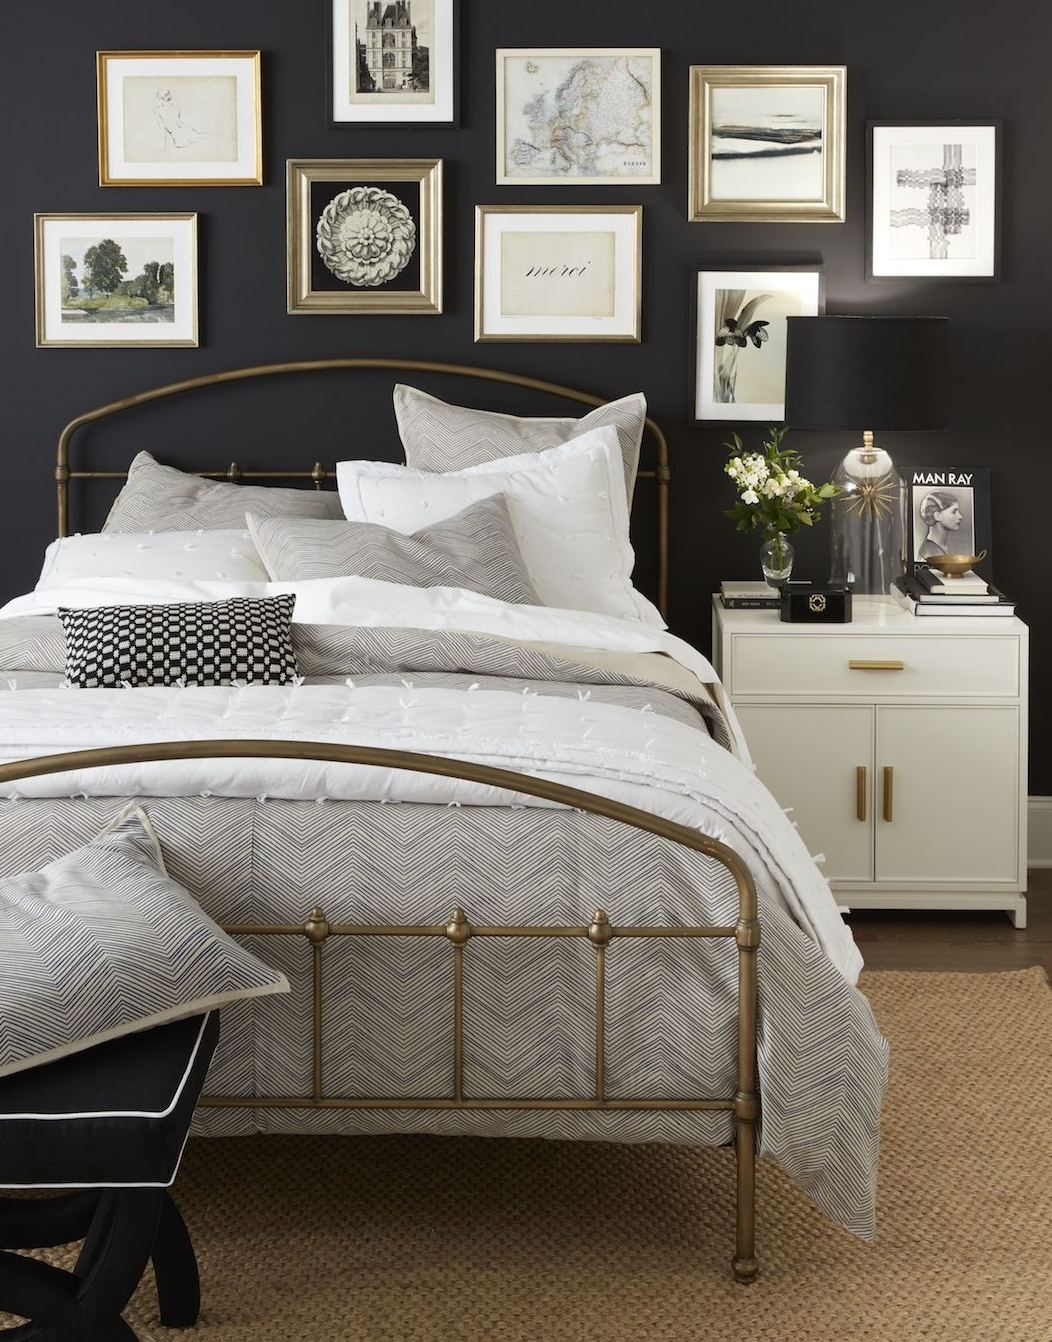 Ballard Designs - Bed Styling